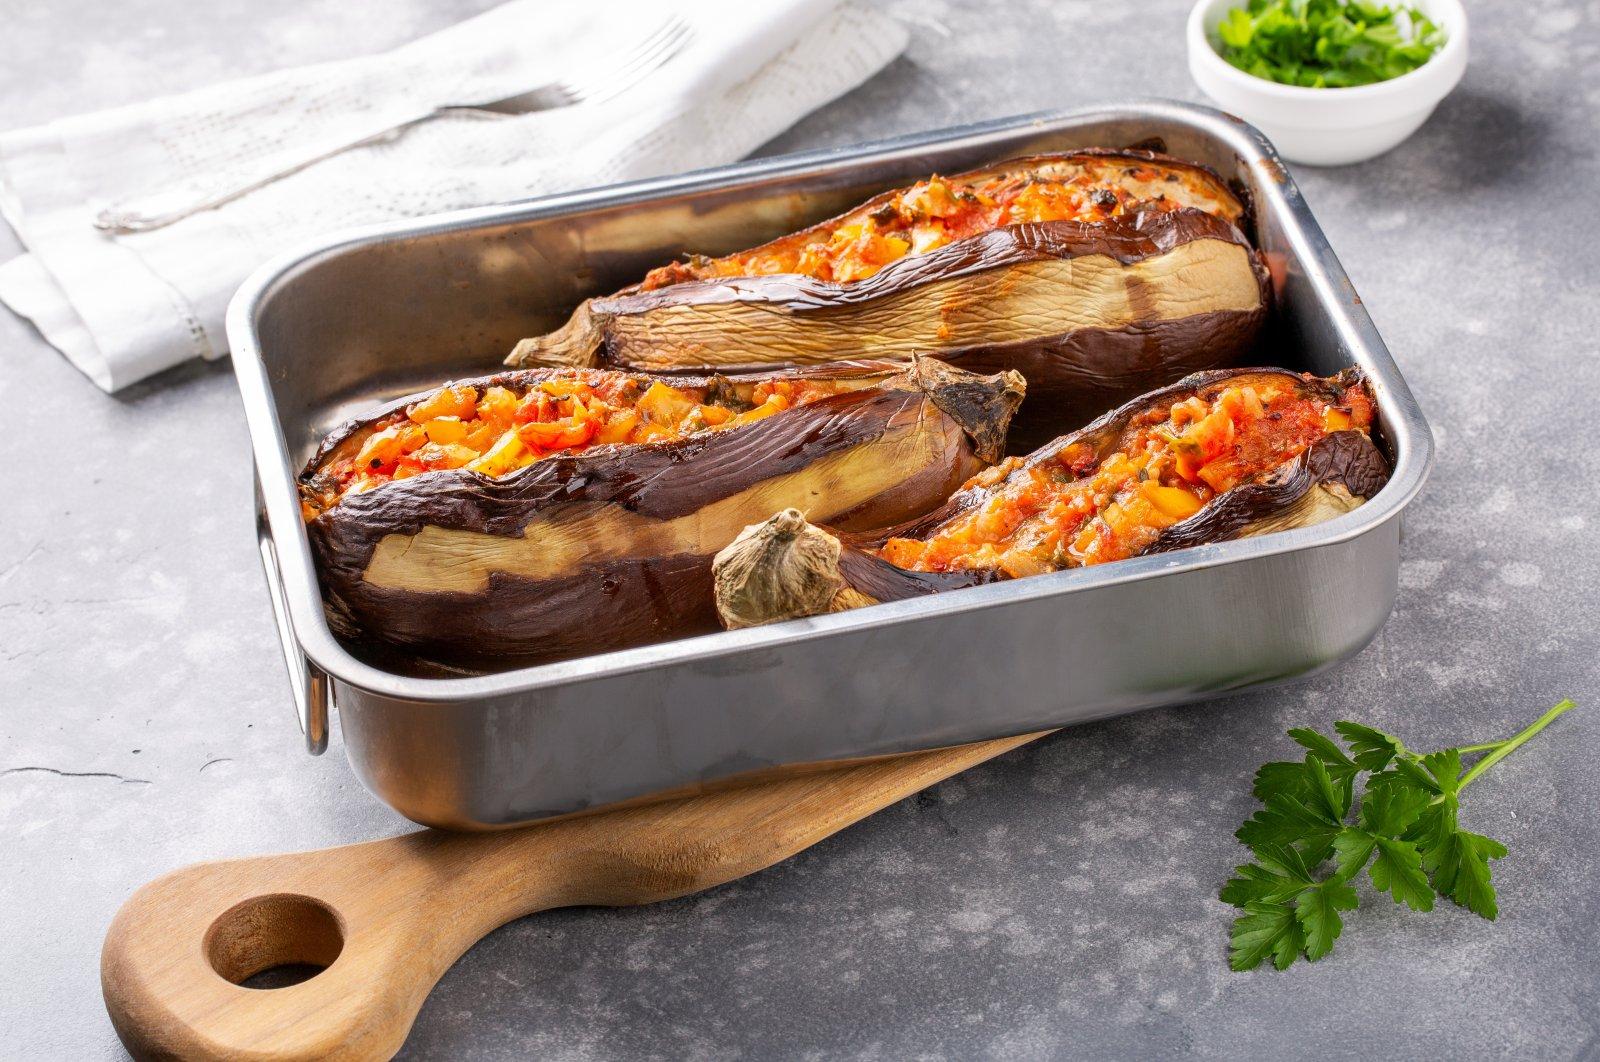 Imam Bayıldı is one of the most popular dishes inTurkish cuisine. (Shutterstock Photo)